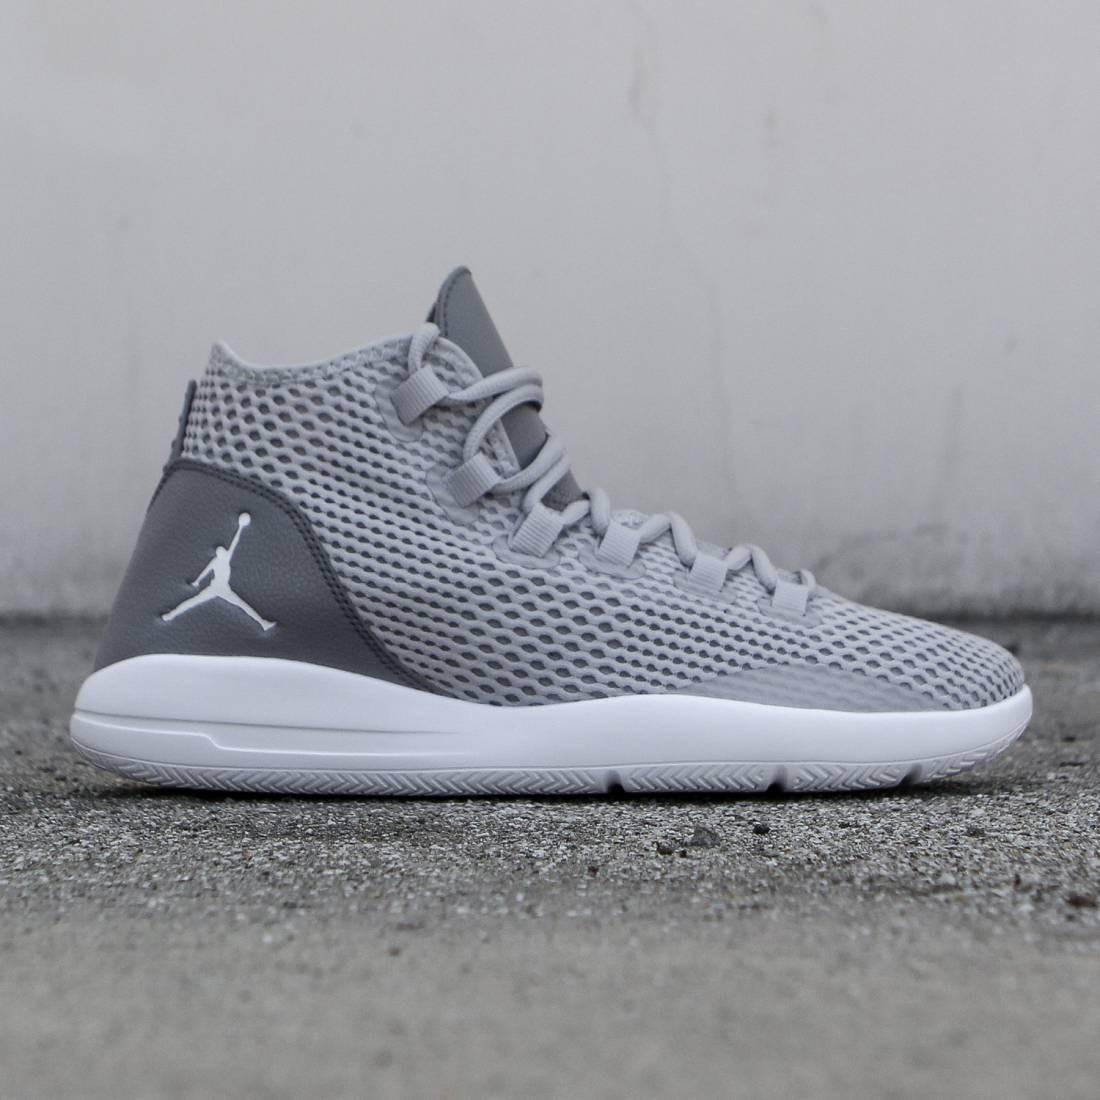 promo code a23a4 9062a Jordan Men Jordan Reveal (wolf grey cool grey infrared 23 white)